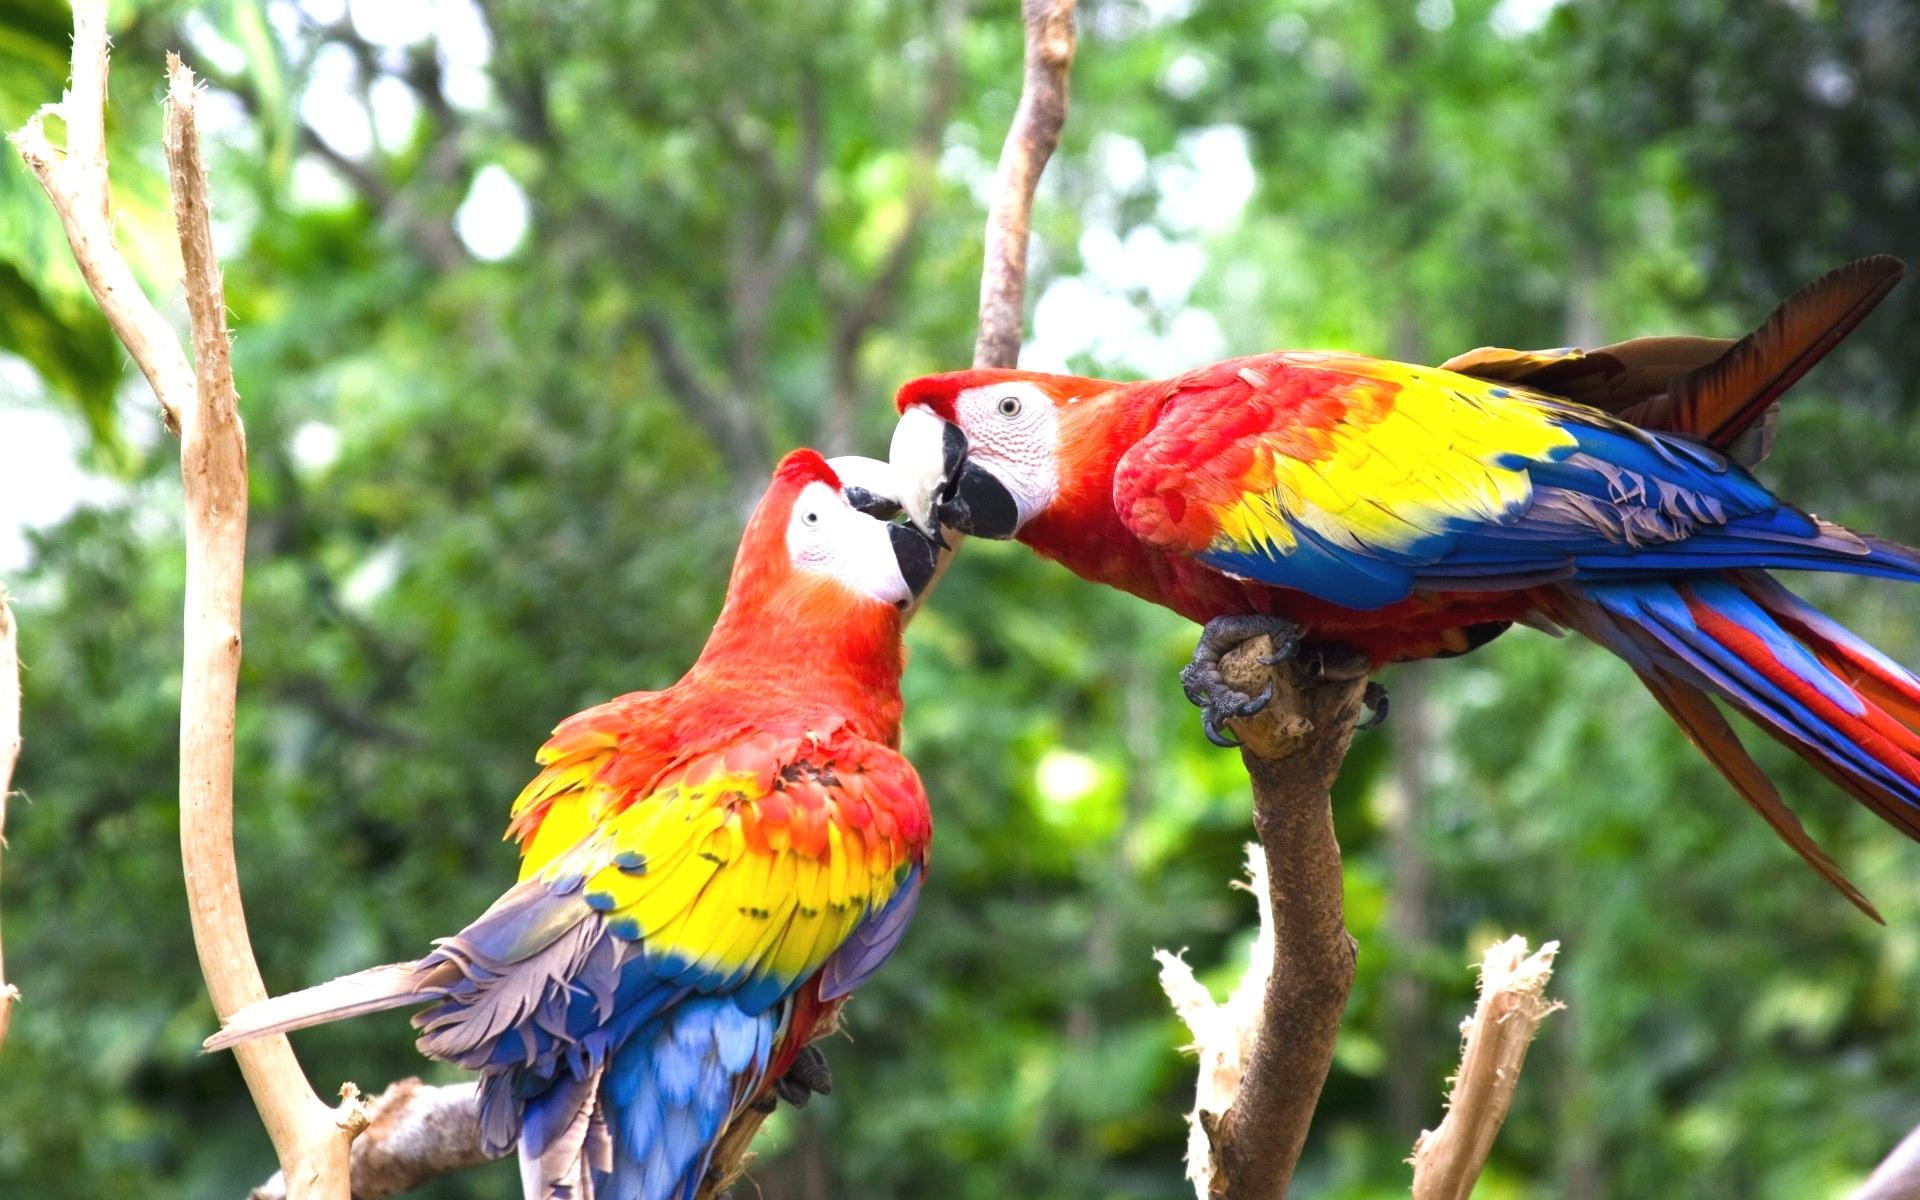 Value Love Bird Images Colorful Parrot Birds Photos 1920x1200